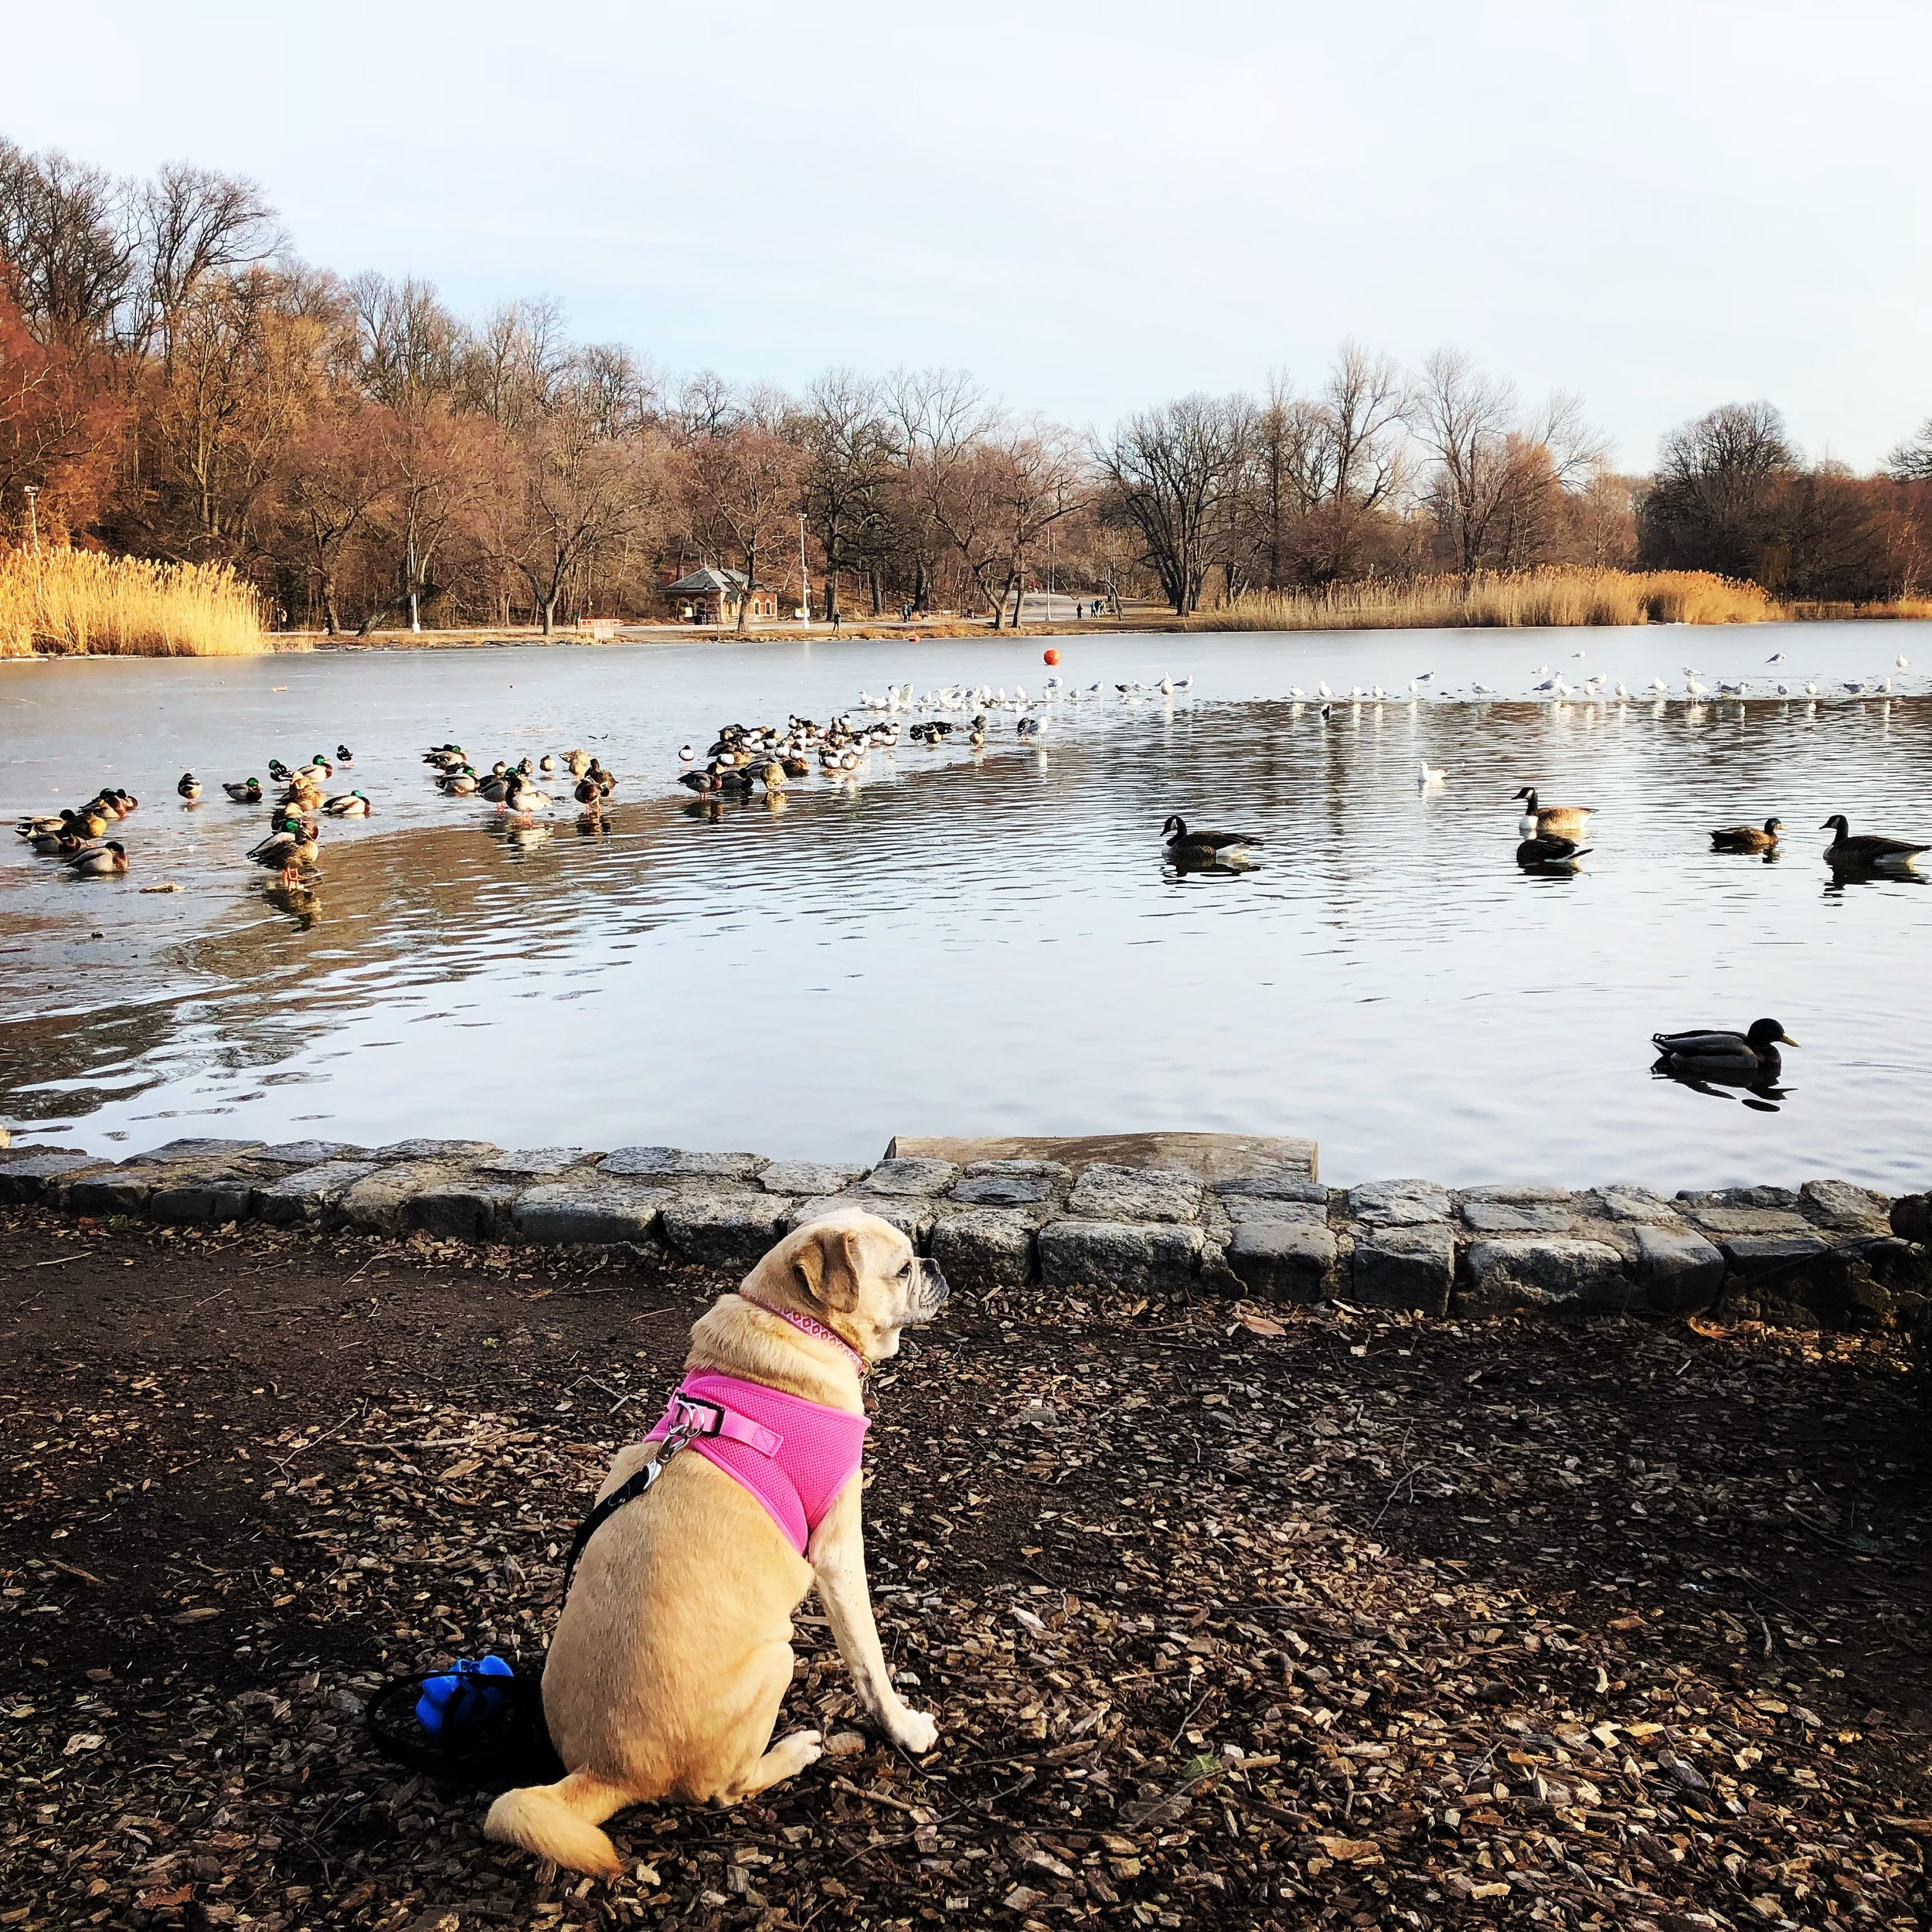 Duck 🦆 duck 🦆 duck 🦆 duck 🦆 ... (Propsect Park 1/2018)